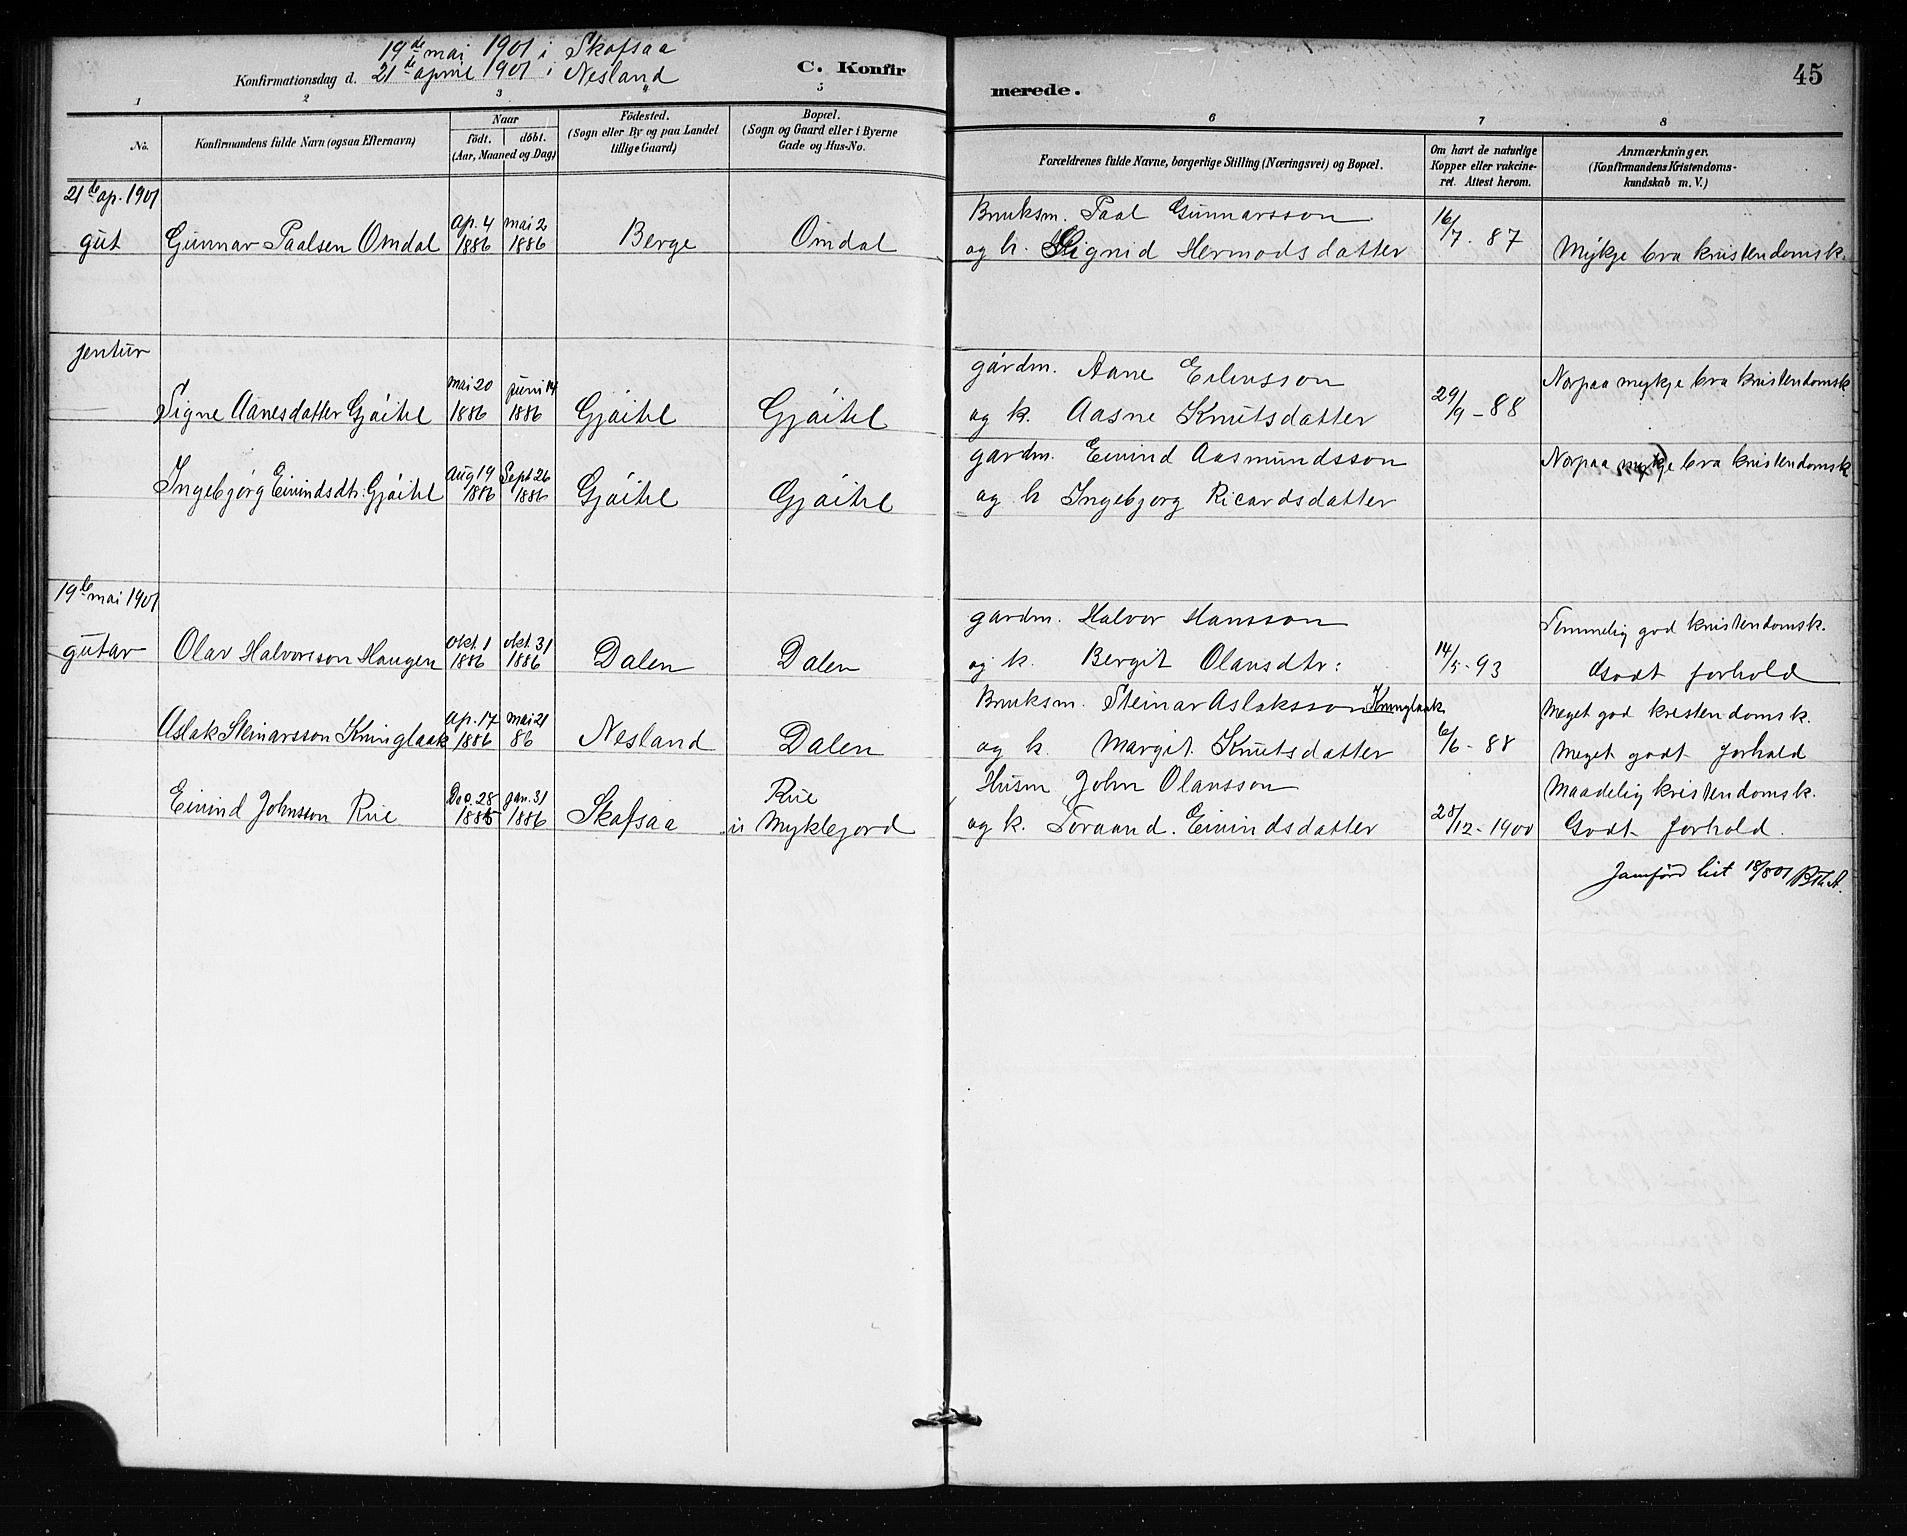 SAKO, Lårdal kirkebøker, G/Gb/L0003: Klokkerbok nr. II 3, 1889-1920, s. 45